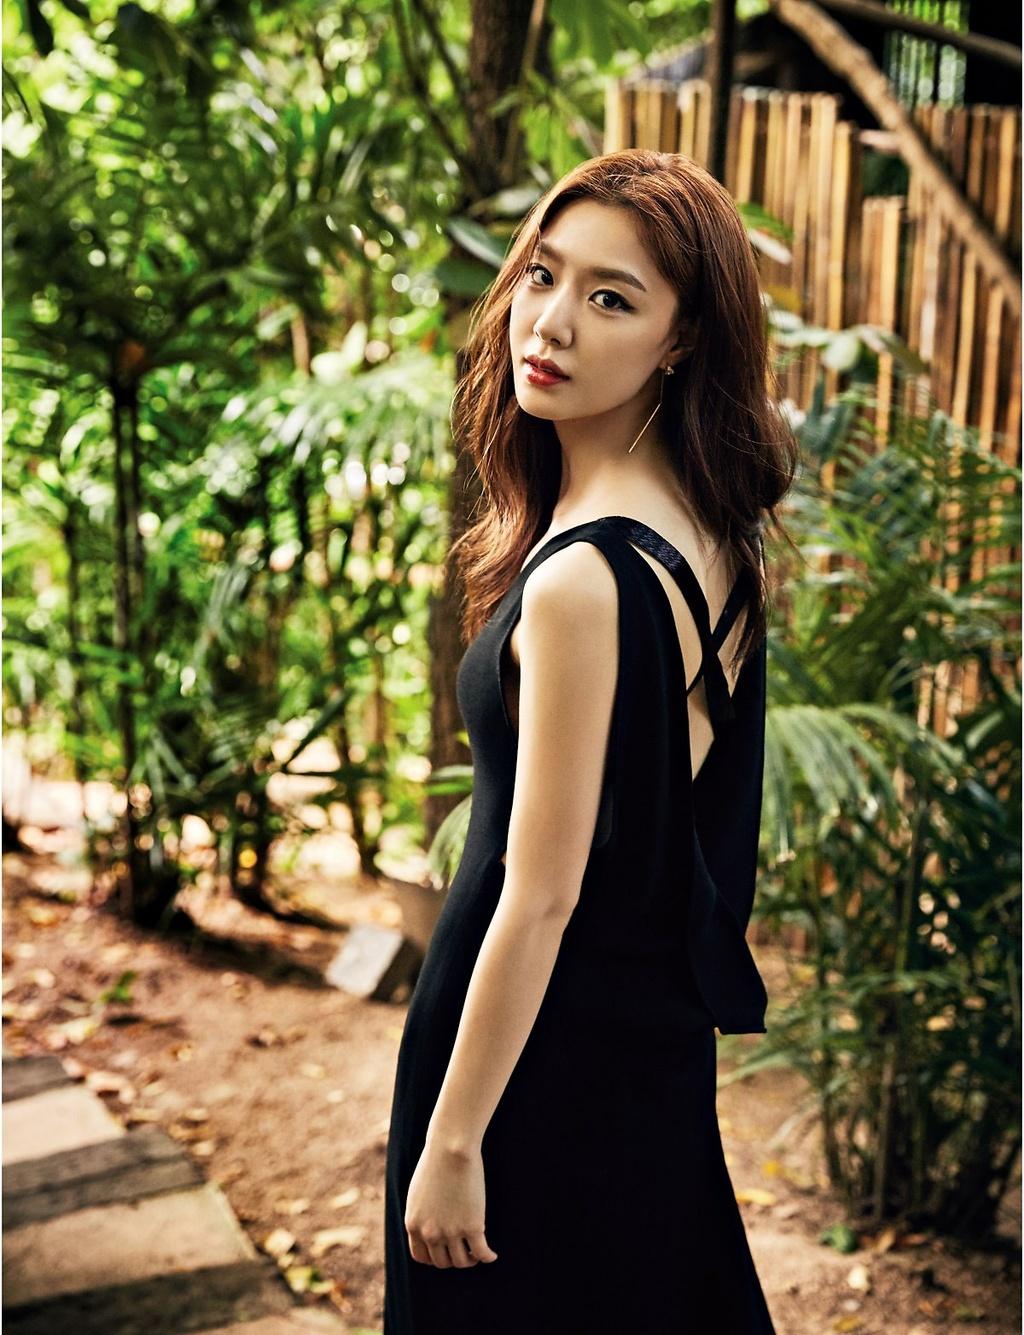 Seo Ji Hye - my nhan co su nghiep lan dan cua 'Ha canh noi anh' hinh anh 11 F1B4543y_1_s.jpg